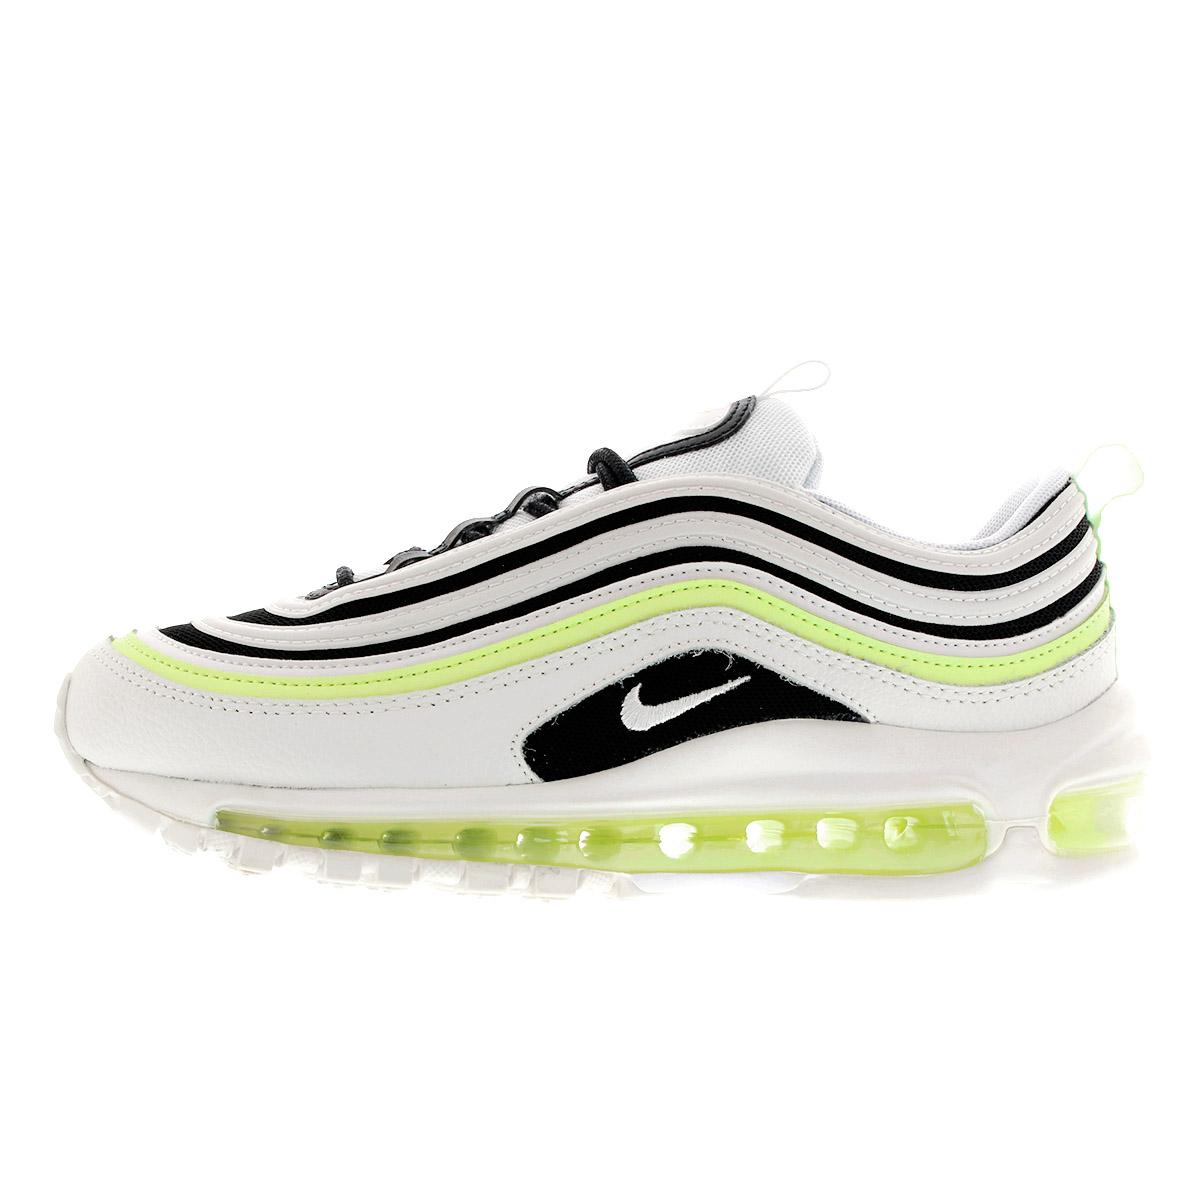 NIKE WMNS AIR MAX 97 Nike women Air Max 97 SUMMIT WHITESUMMIT WHITEBLACK 921,733 105